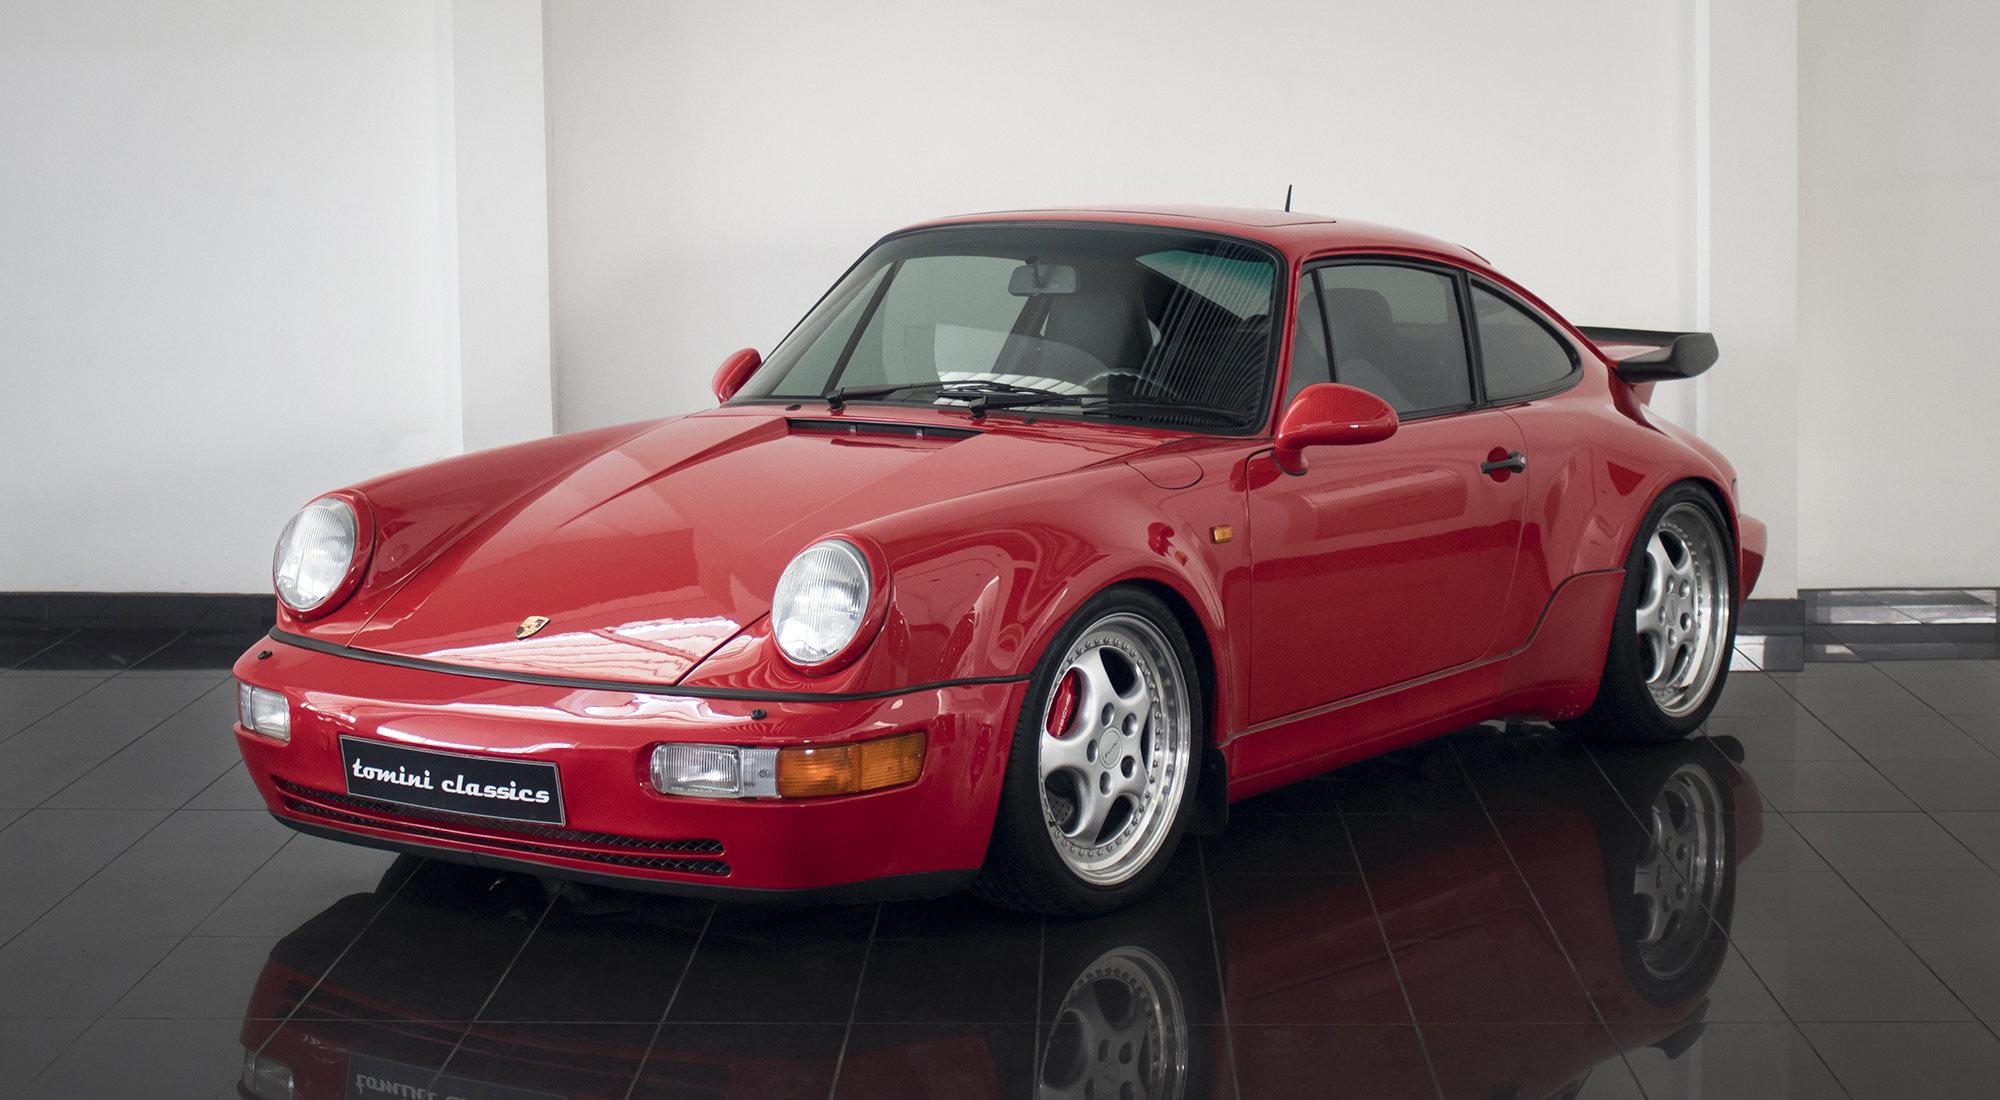 Porsche 964 Turbo 3.6 (1993) For Sale (picture 2 of 6)